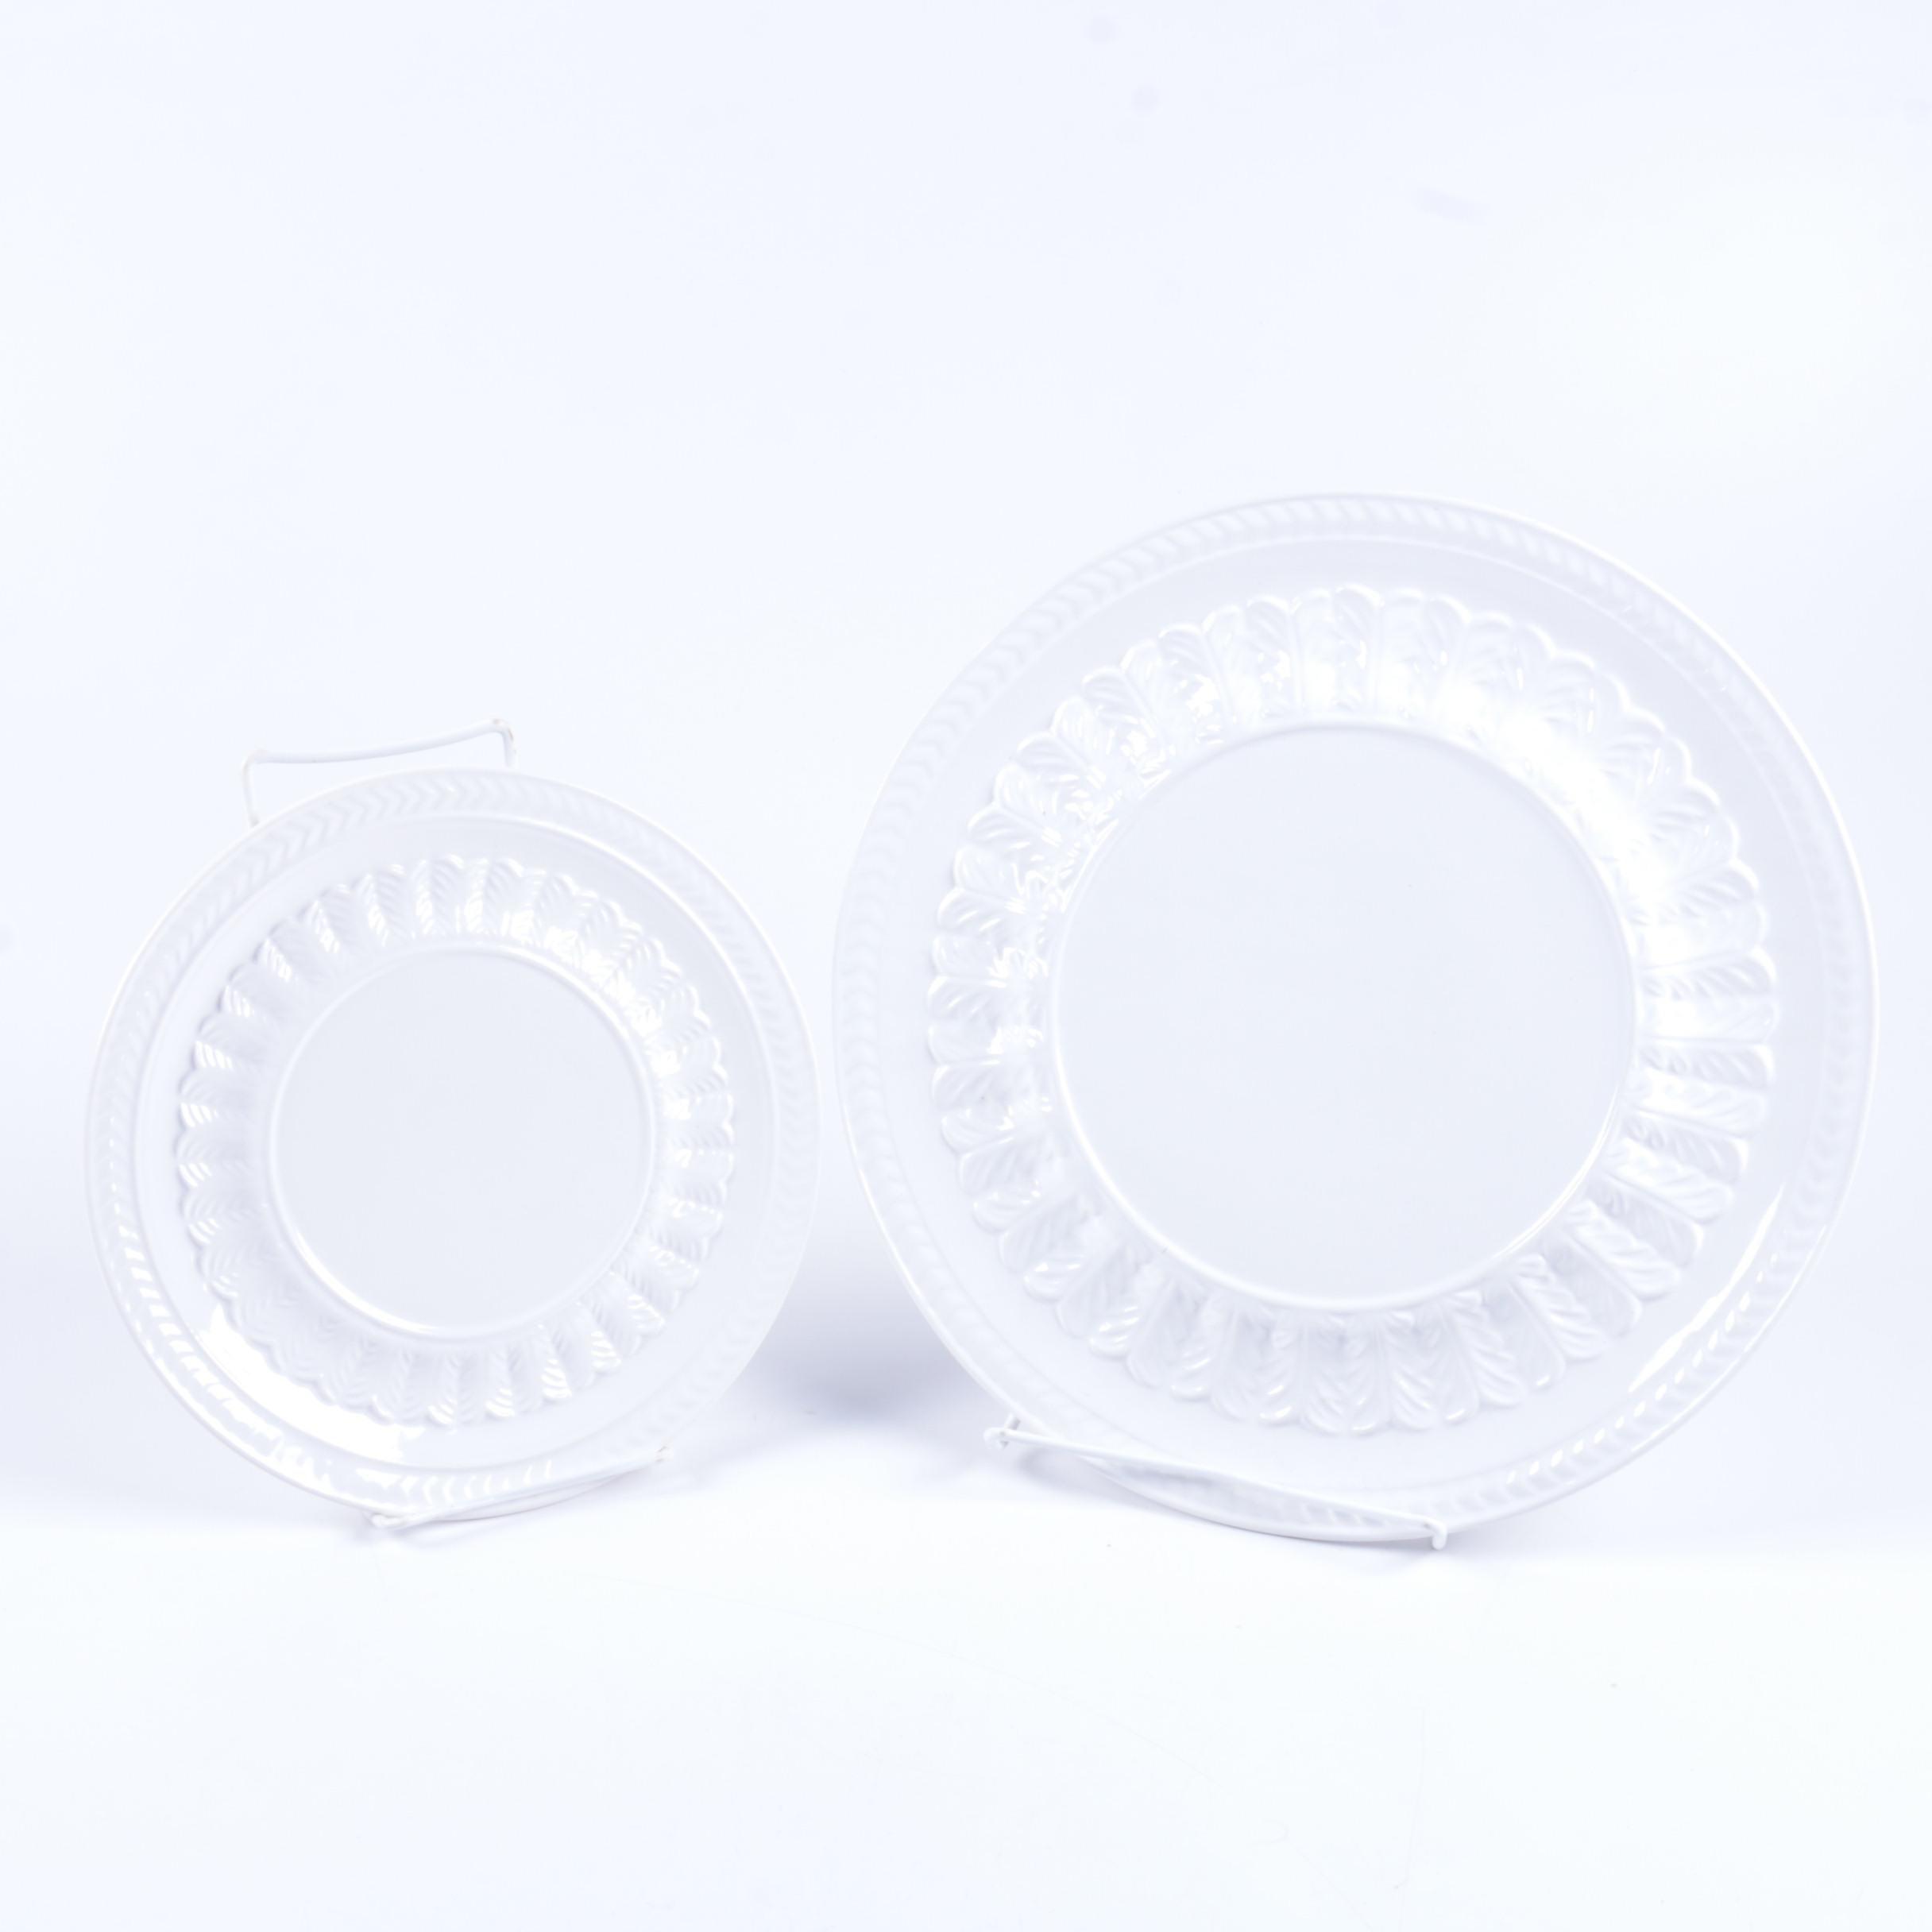 Portuguese Neuwirth Pottery Plates